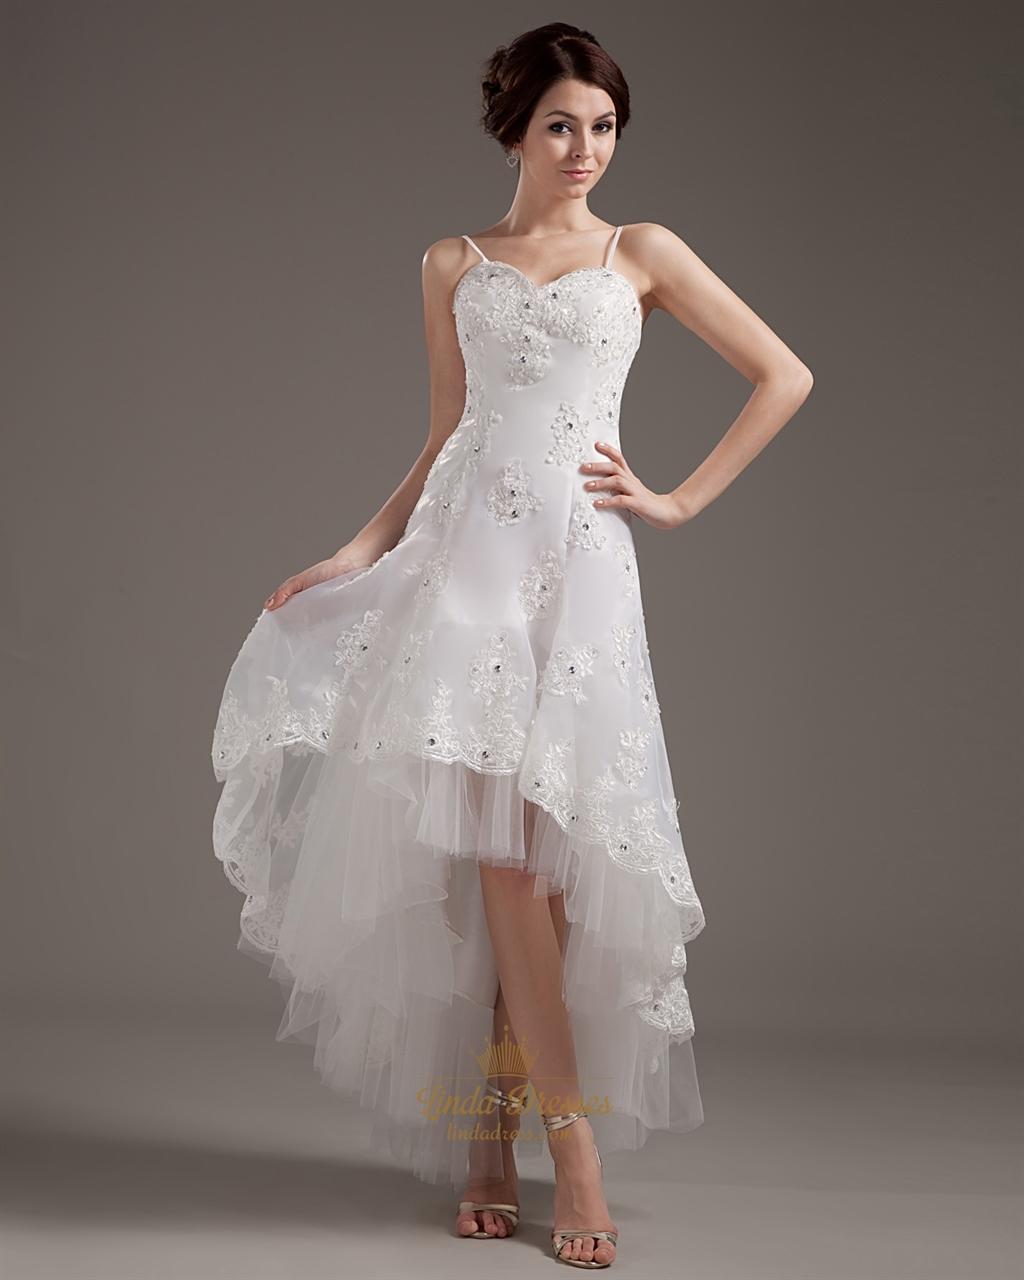 list detail high low wedding dresses high low wedding dress Get Whitney Port s High Low Wedding Dress Look